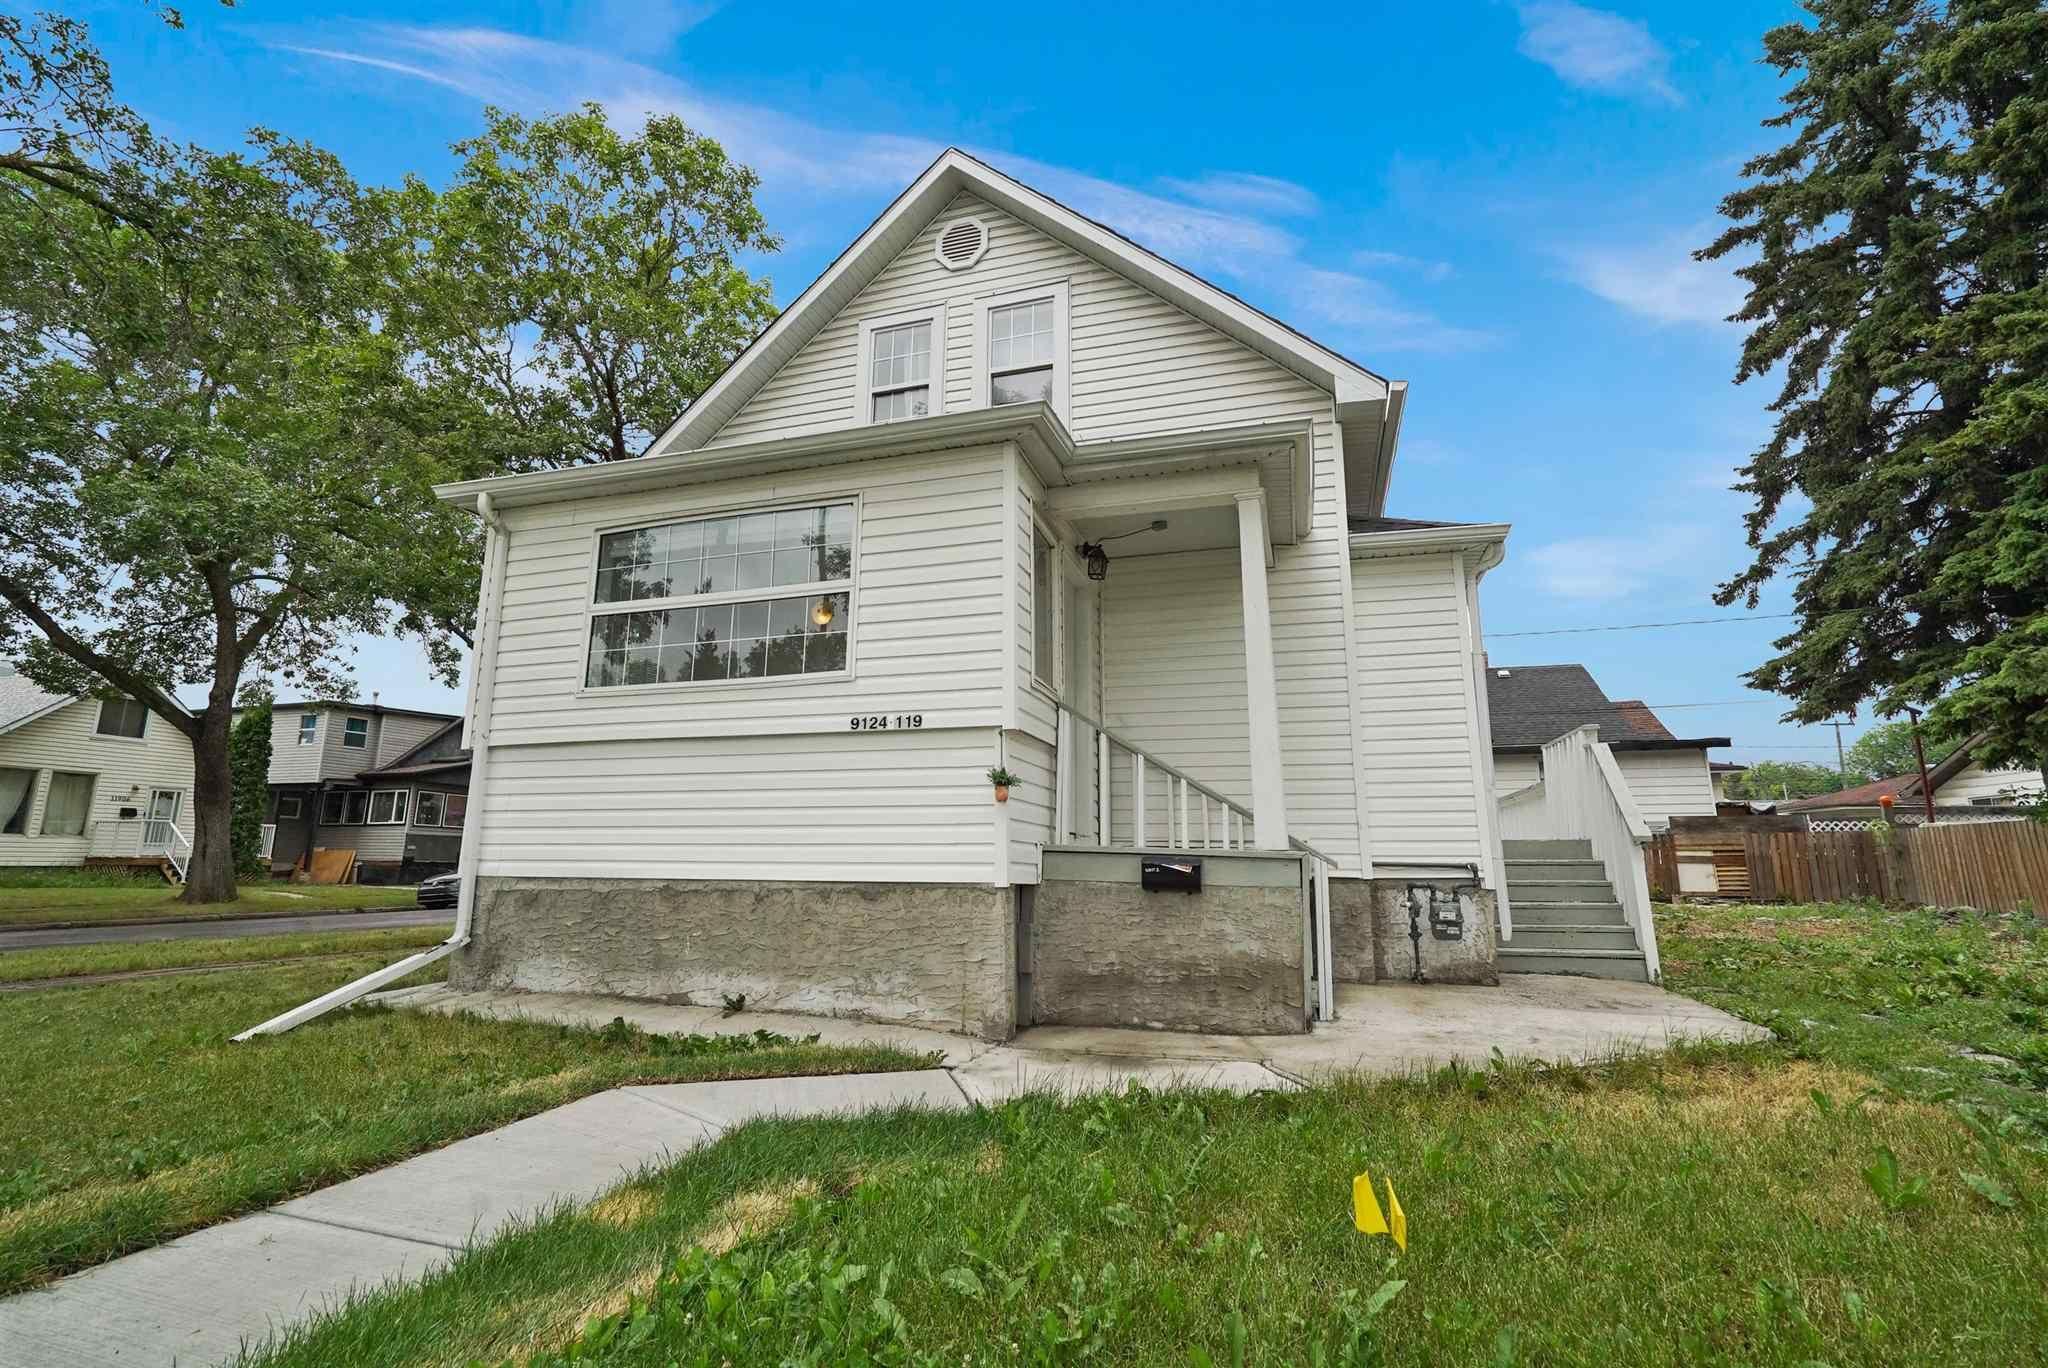 Main Photo: 9124 119 Avenue in Edmonton: Zone 05 House for sale : MLS®# E4264700